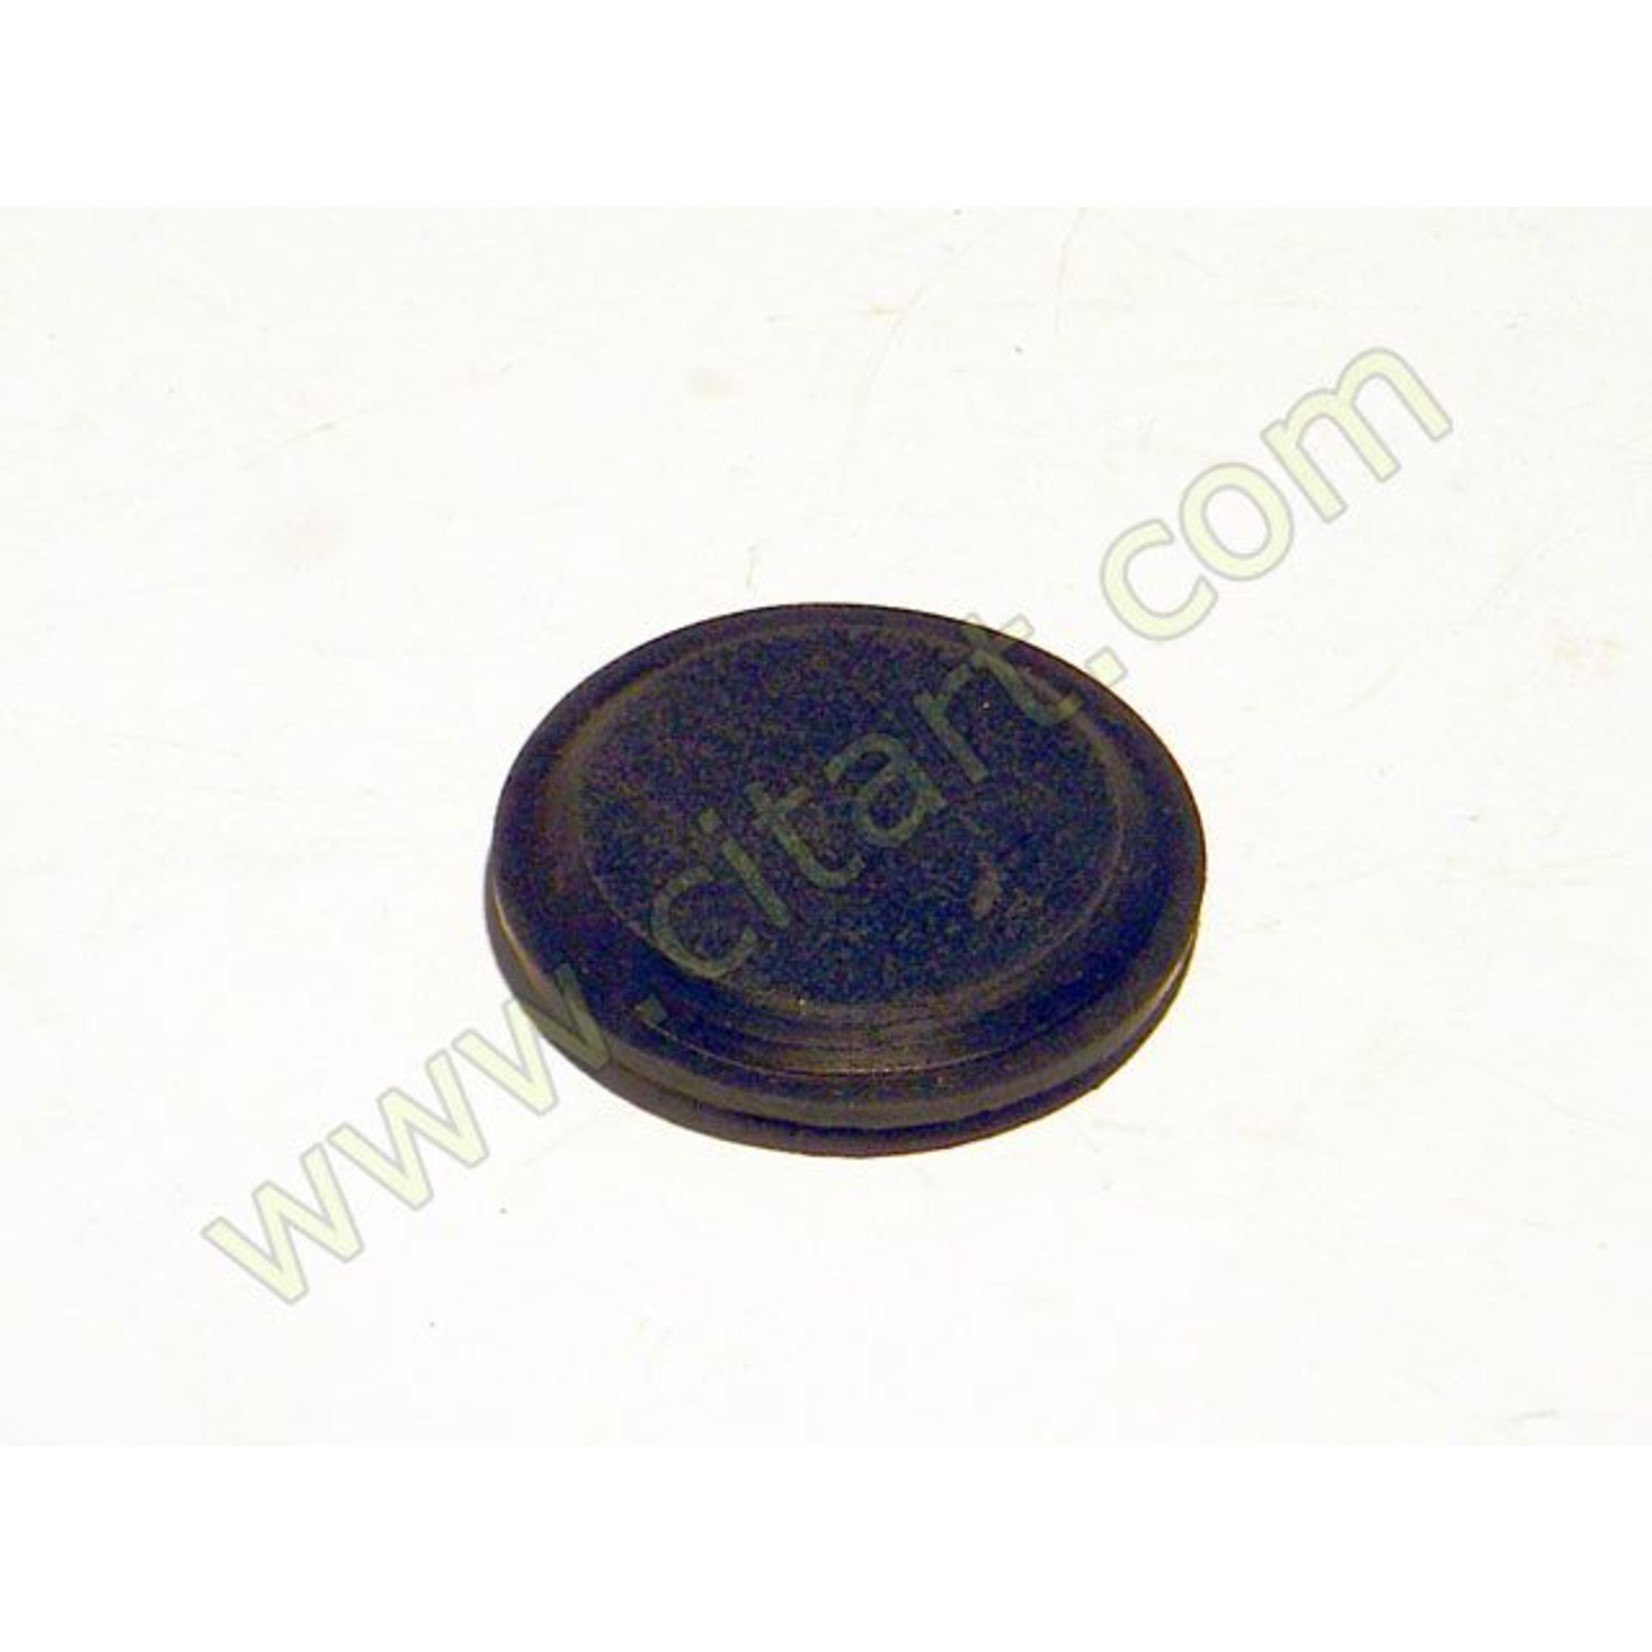 Rubber round plug Nr Org: D96180